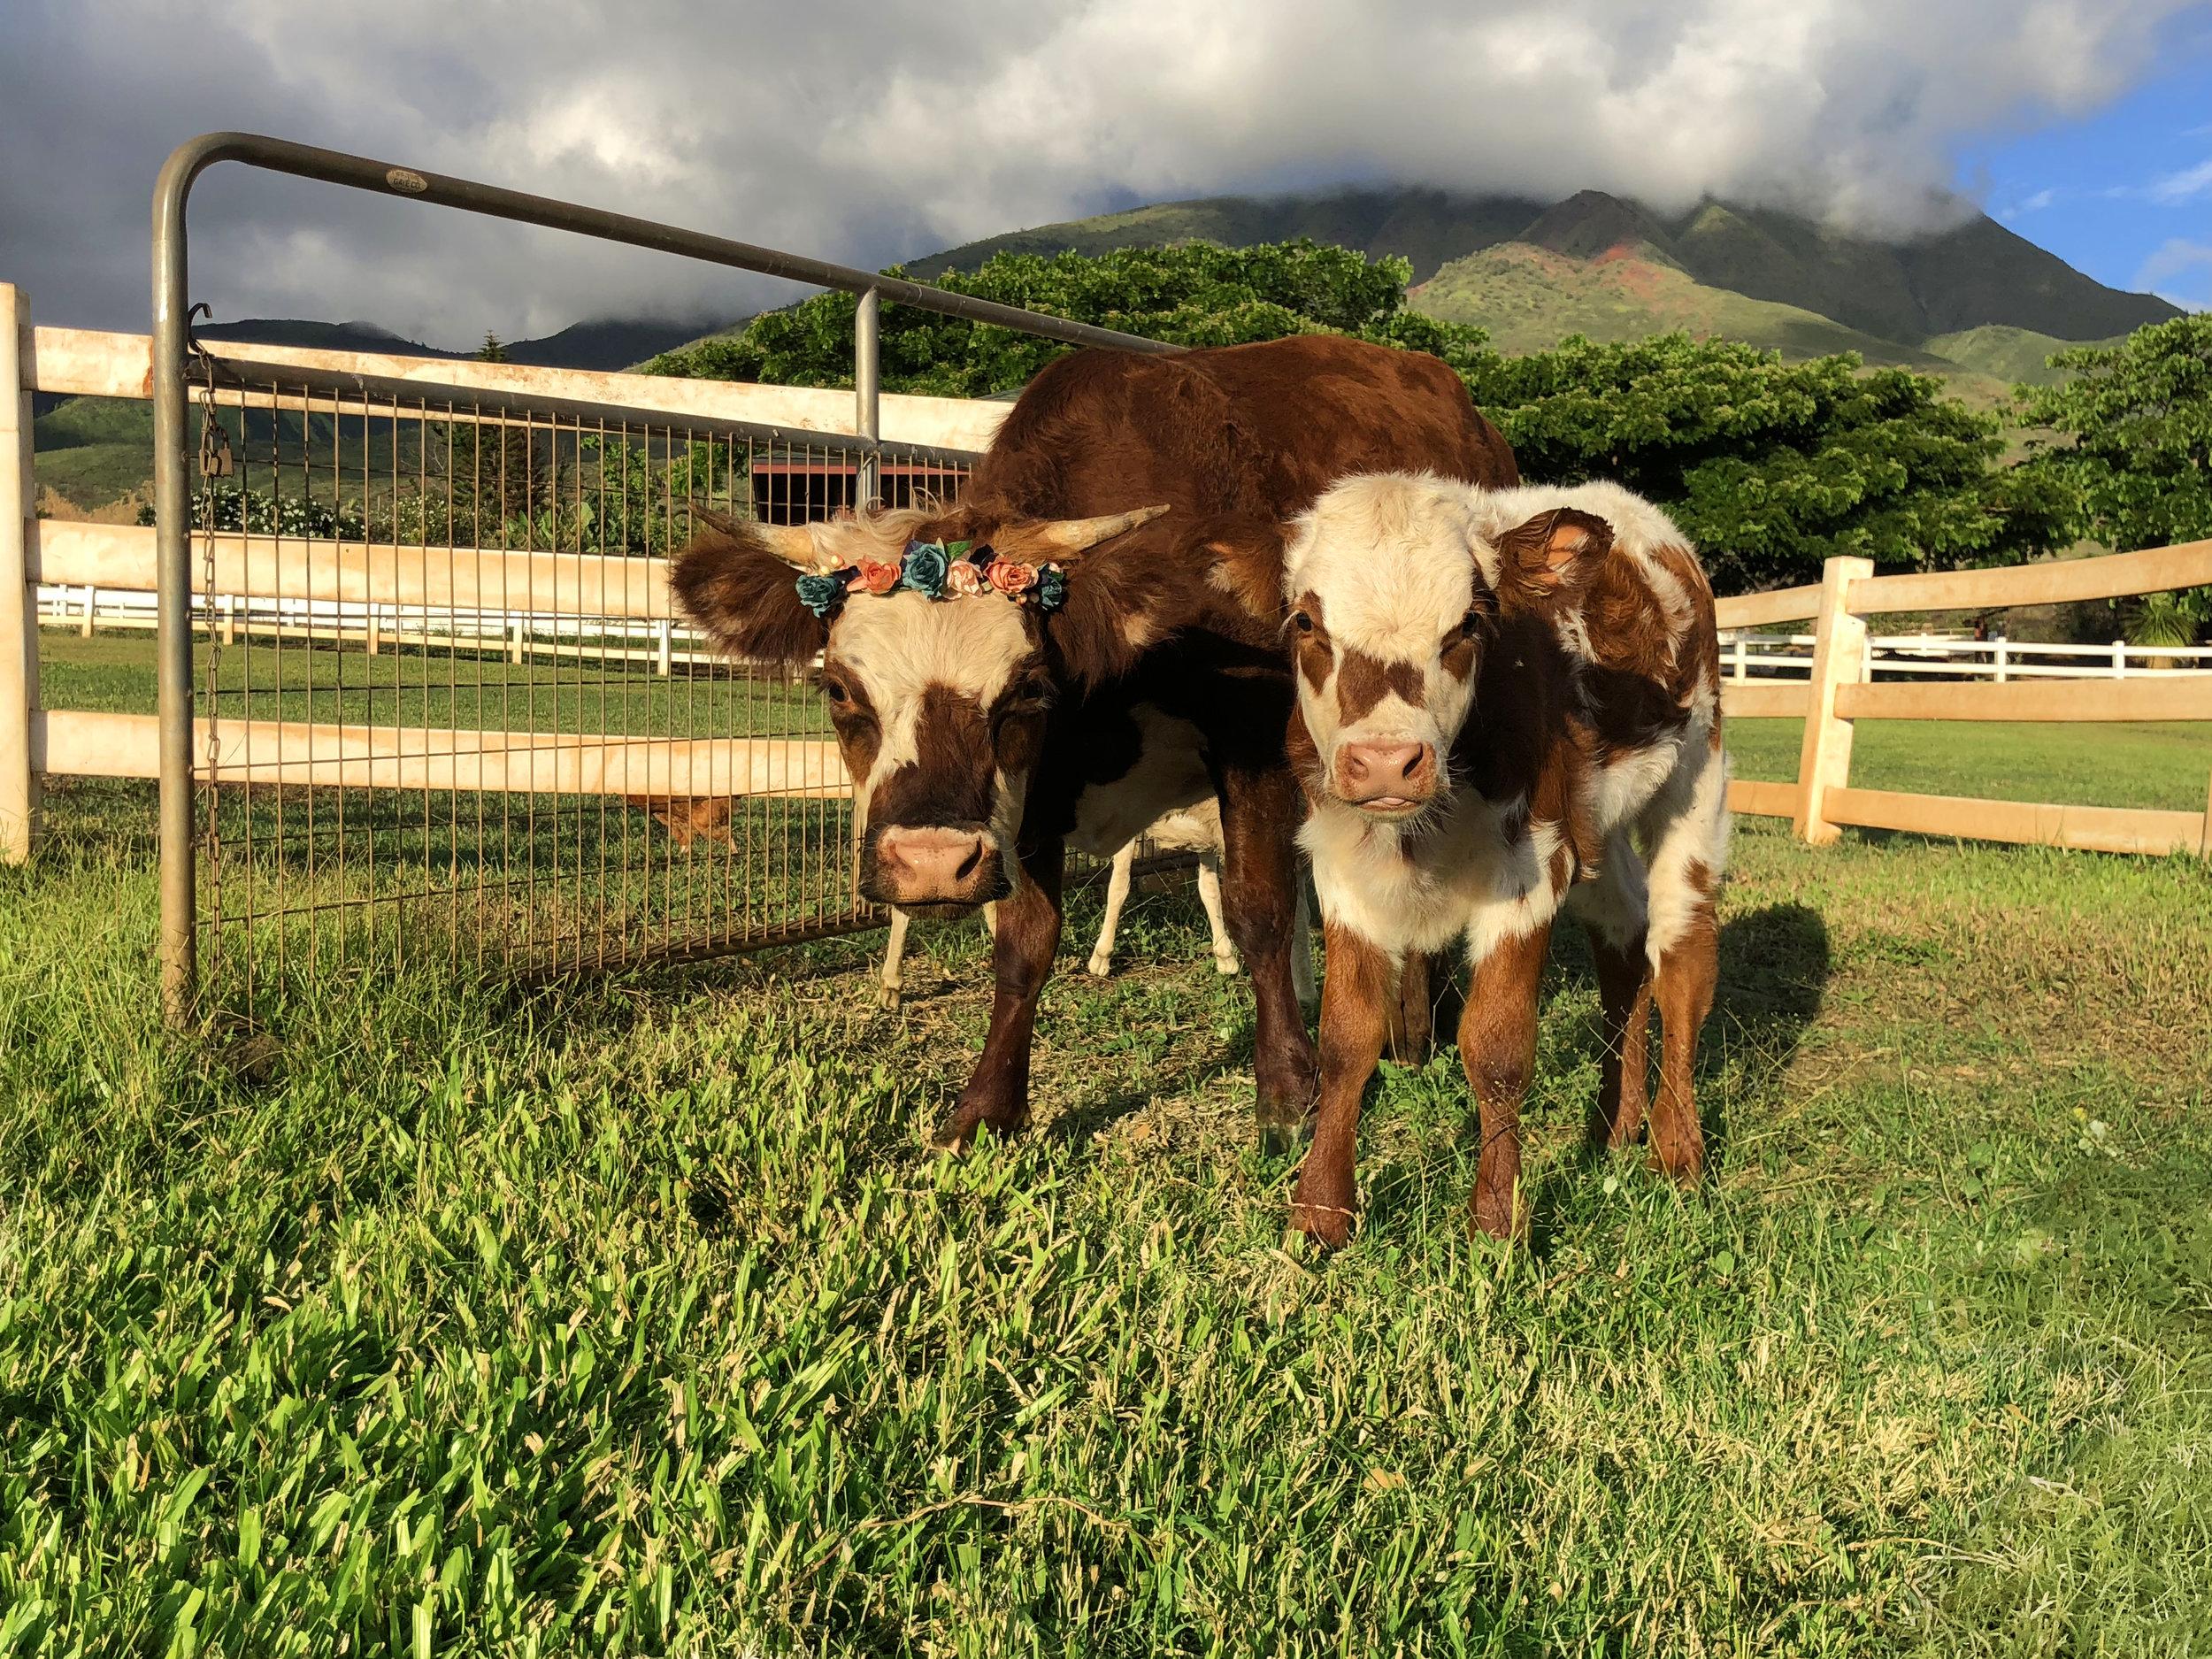 Maui-Lahaina-Animal-petting-zoo-cows1.jpg